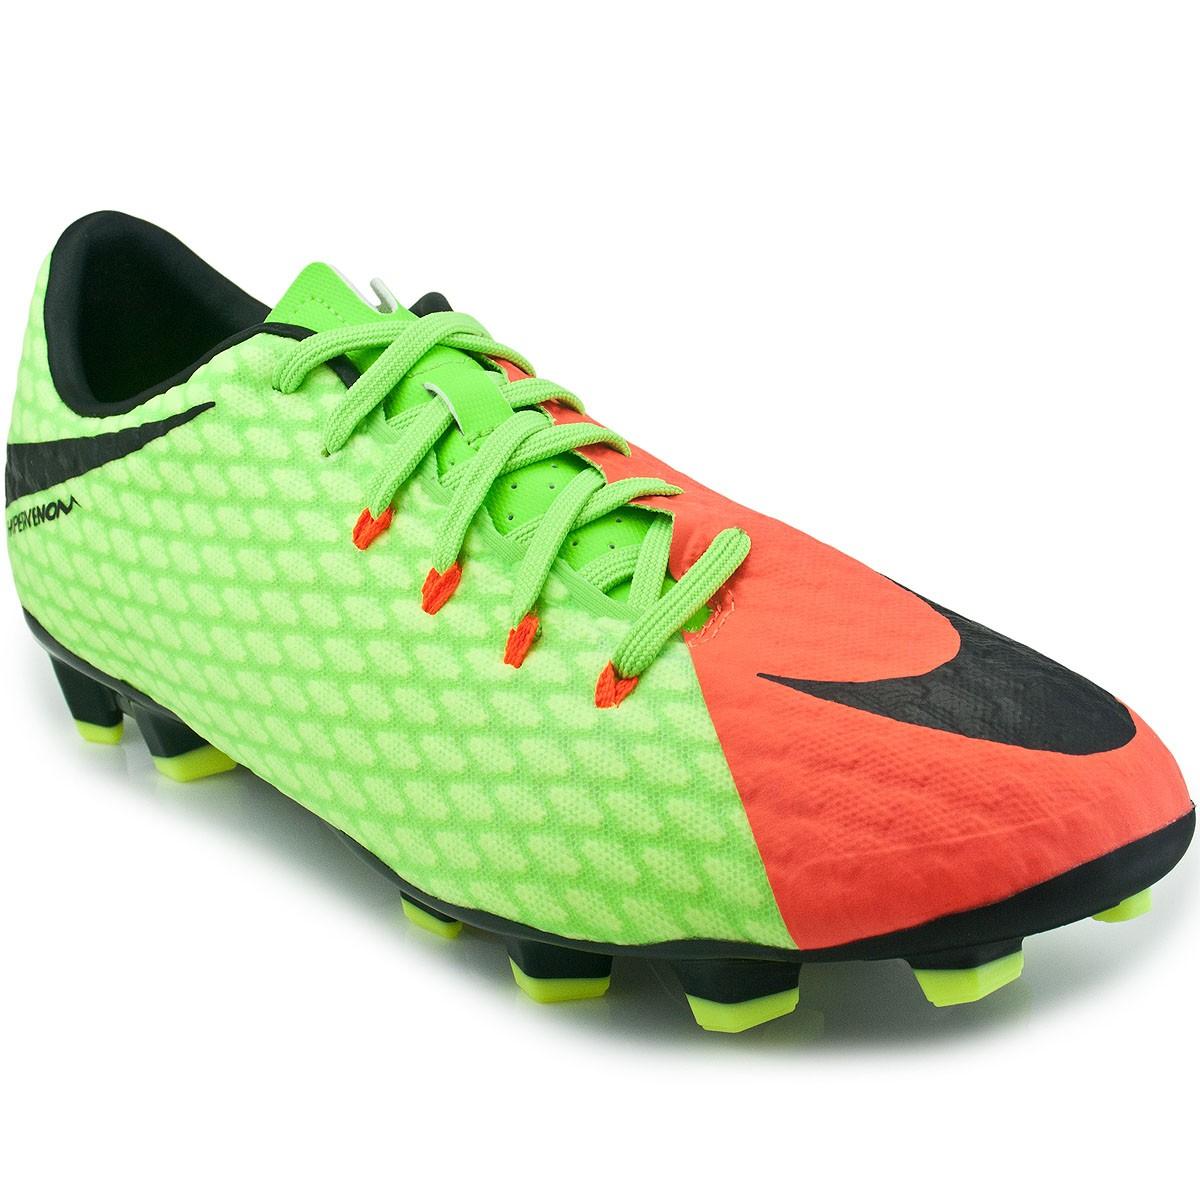 6c321b2ee6005 Chuteira Nike Hypervenom Phelon III FG | Futebol | MaxTennis